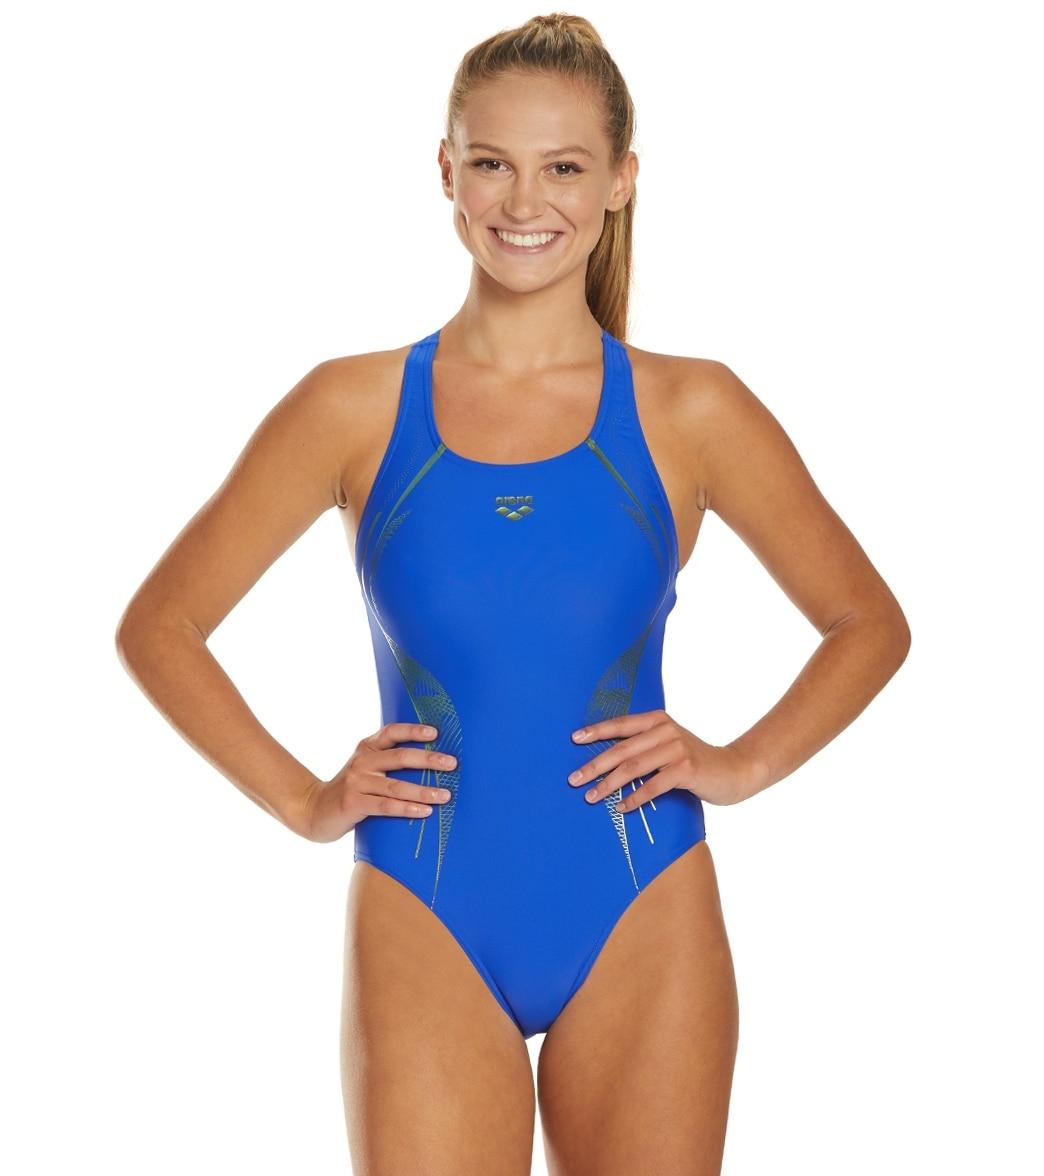 Arena Women's Slinky V Back One Piece Swimsuit